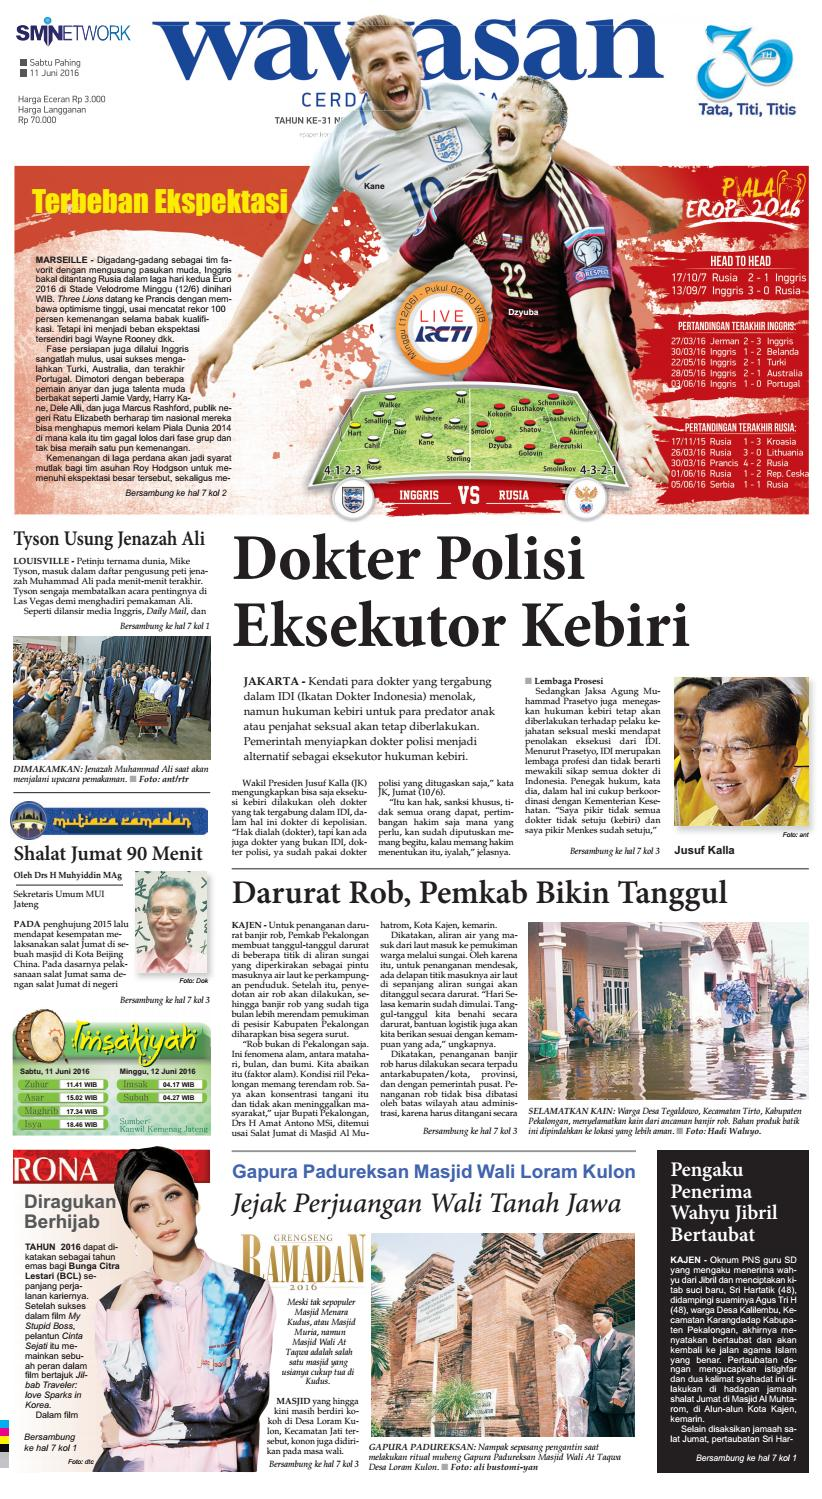 Wawasan 11 Juni 2016 By Koran Pagi Issuu Produk Ukm Bumn Batik Tulis Babon Angrem